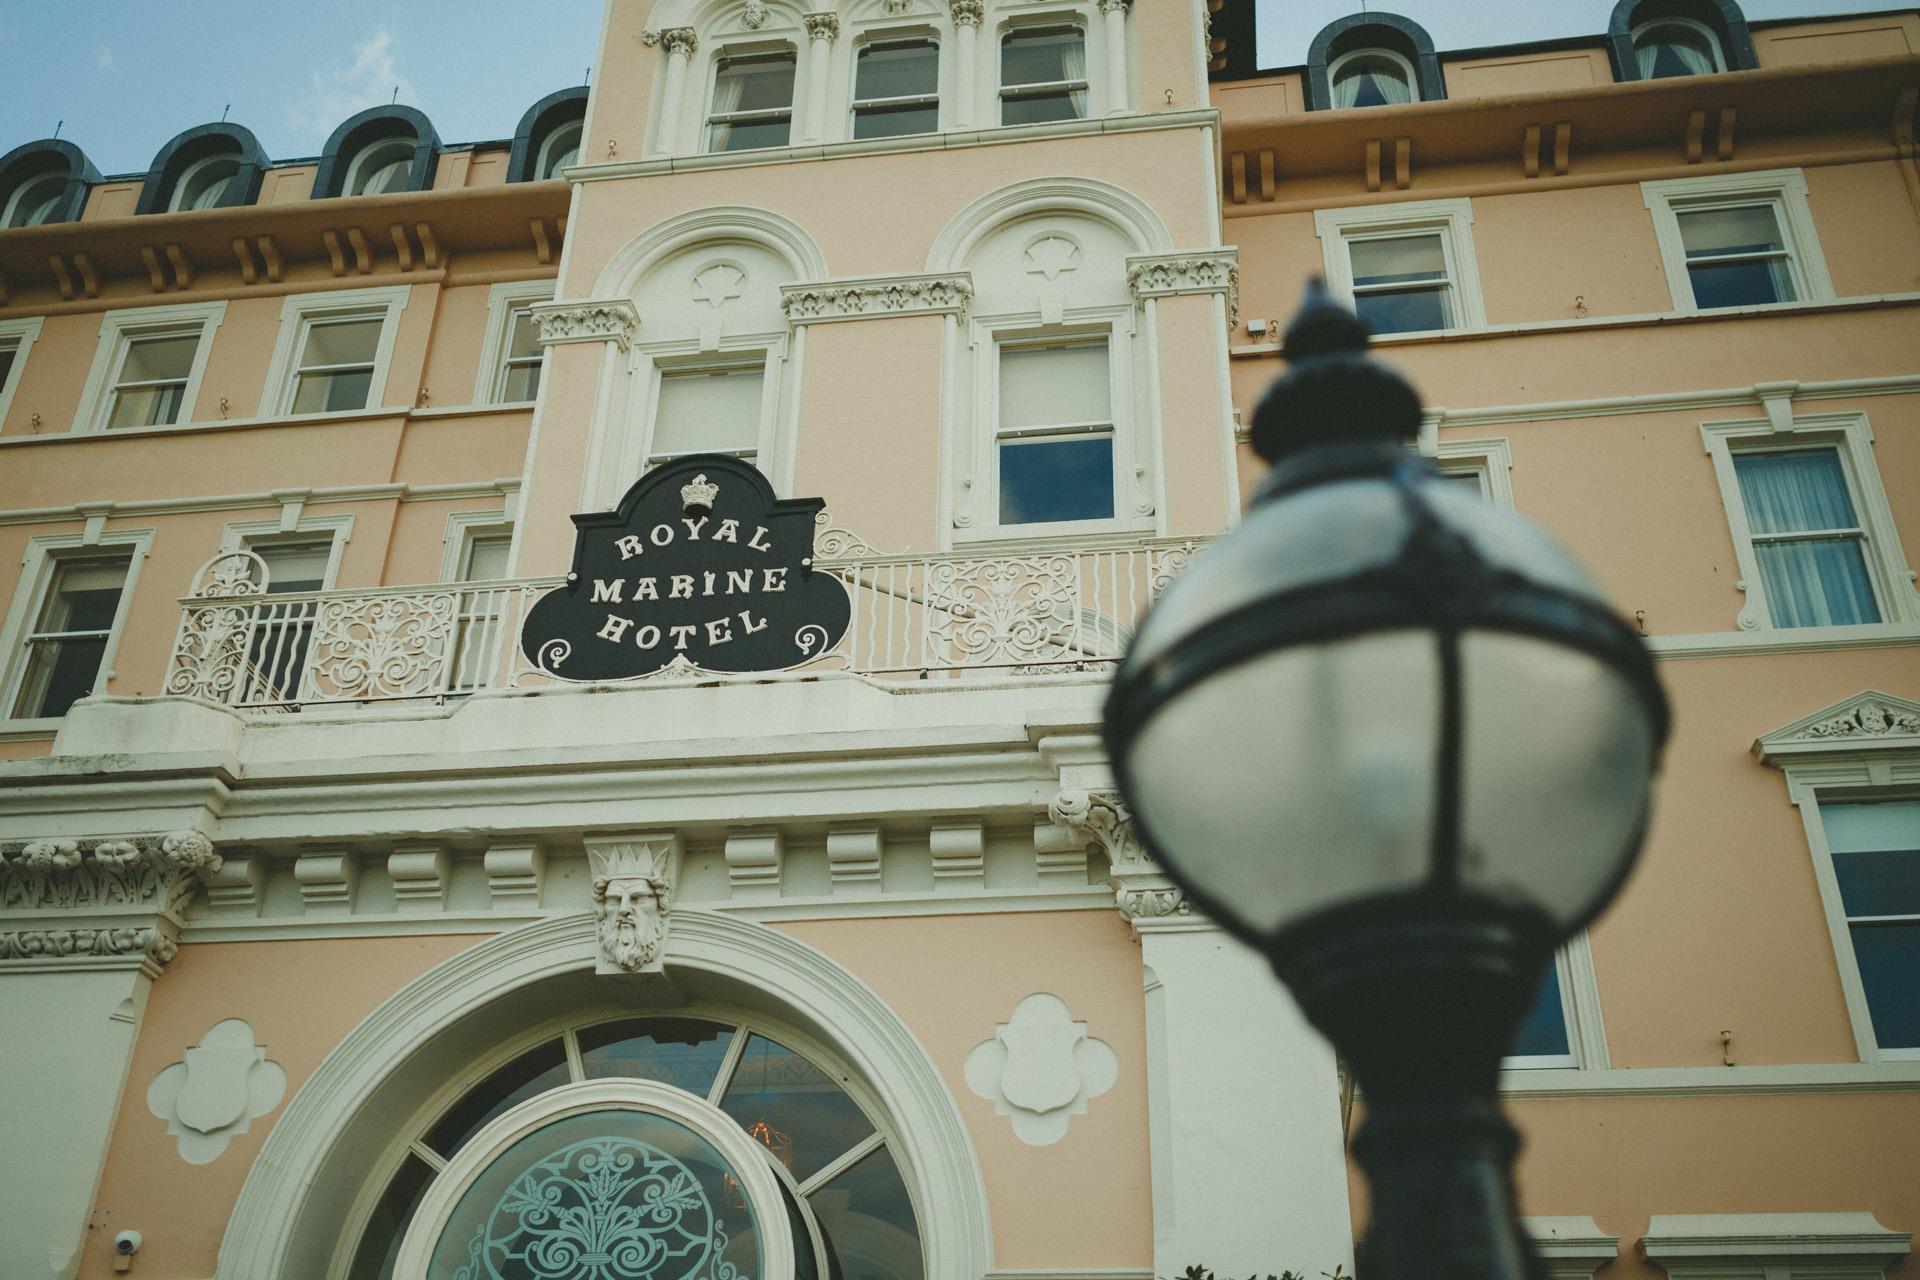 Royal-marine-hotel-wedding-photos8